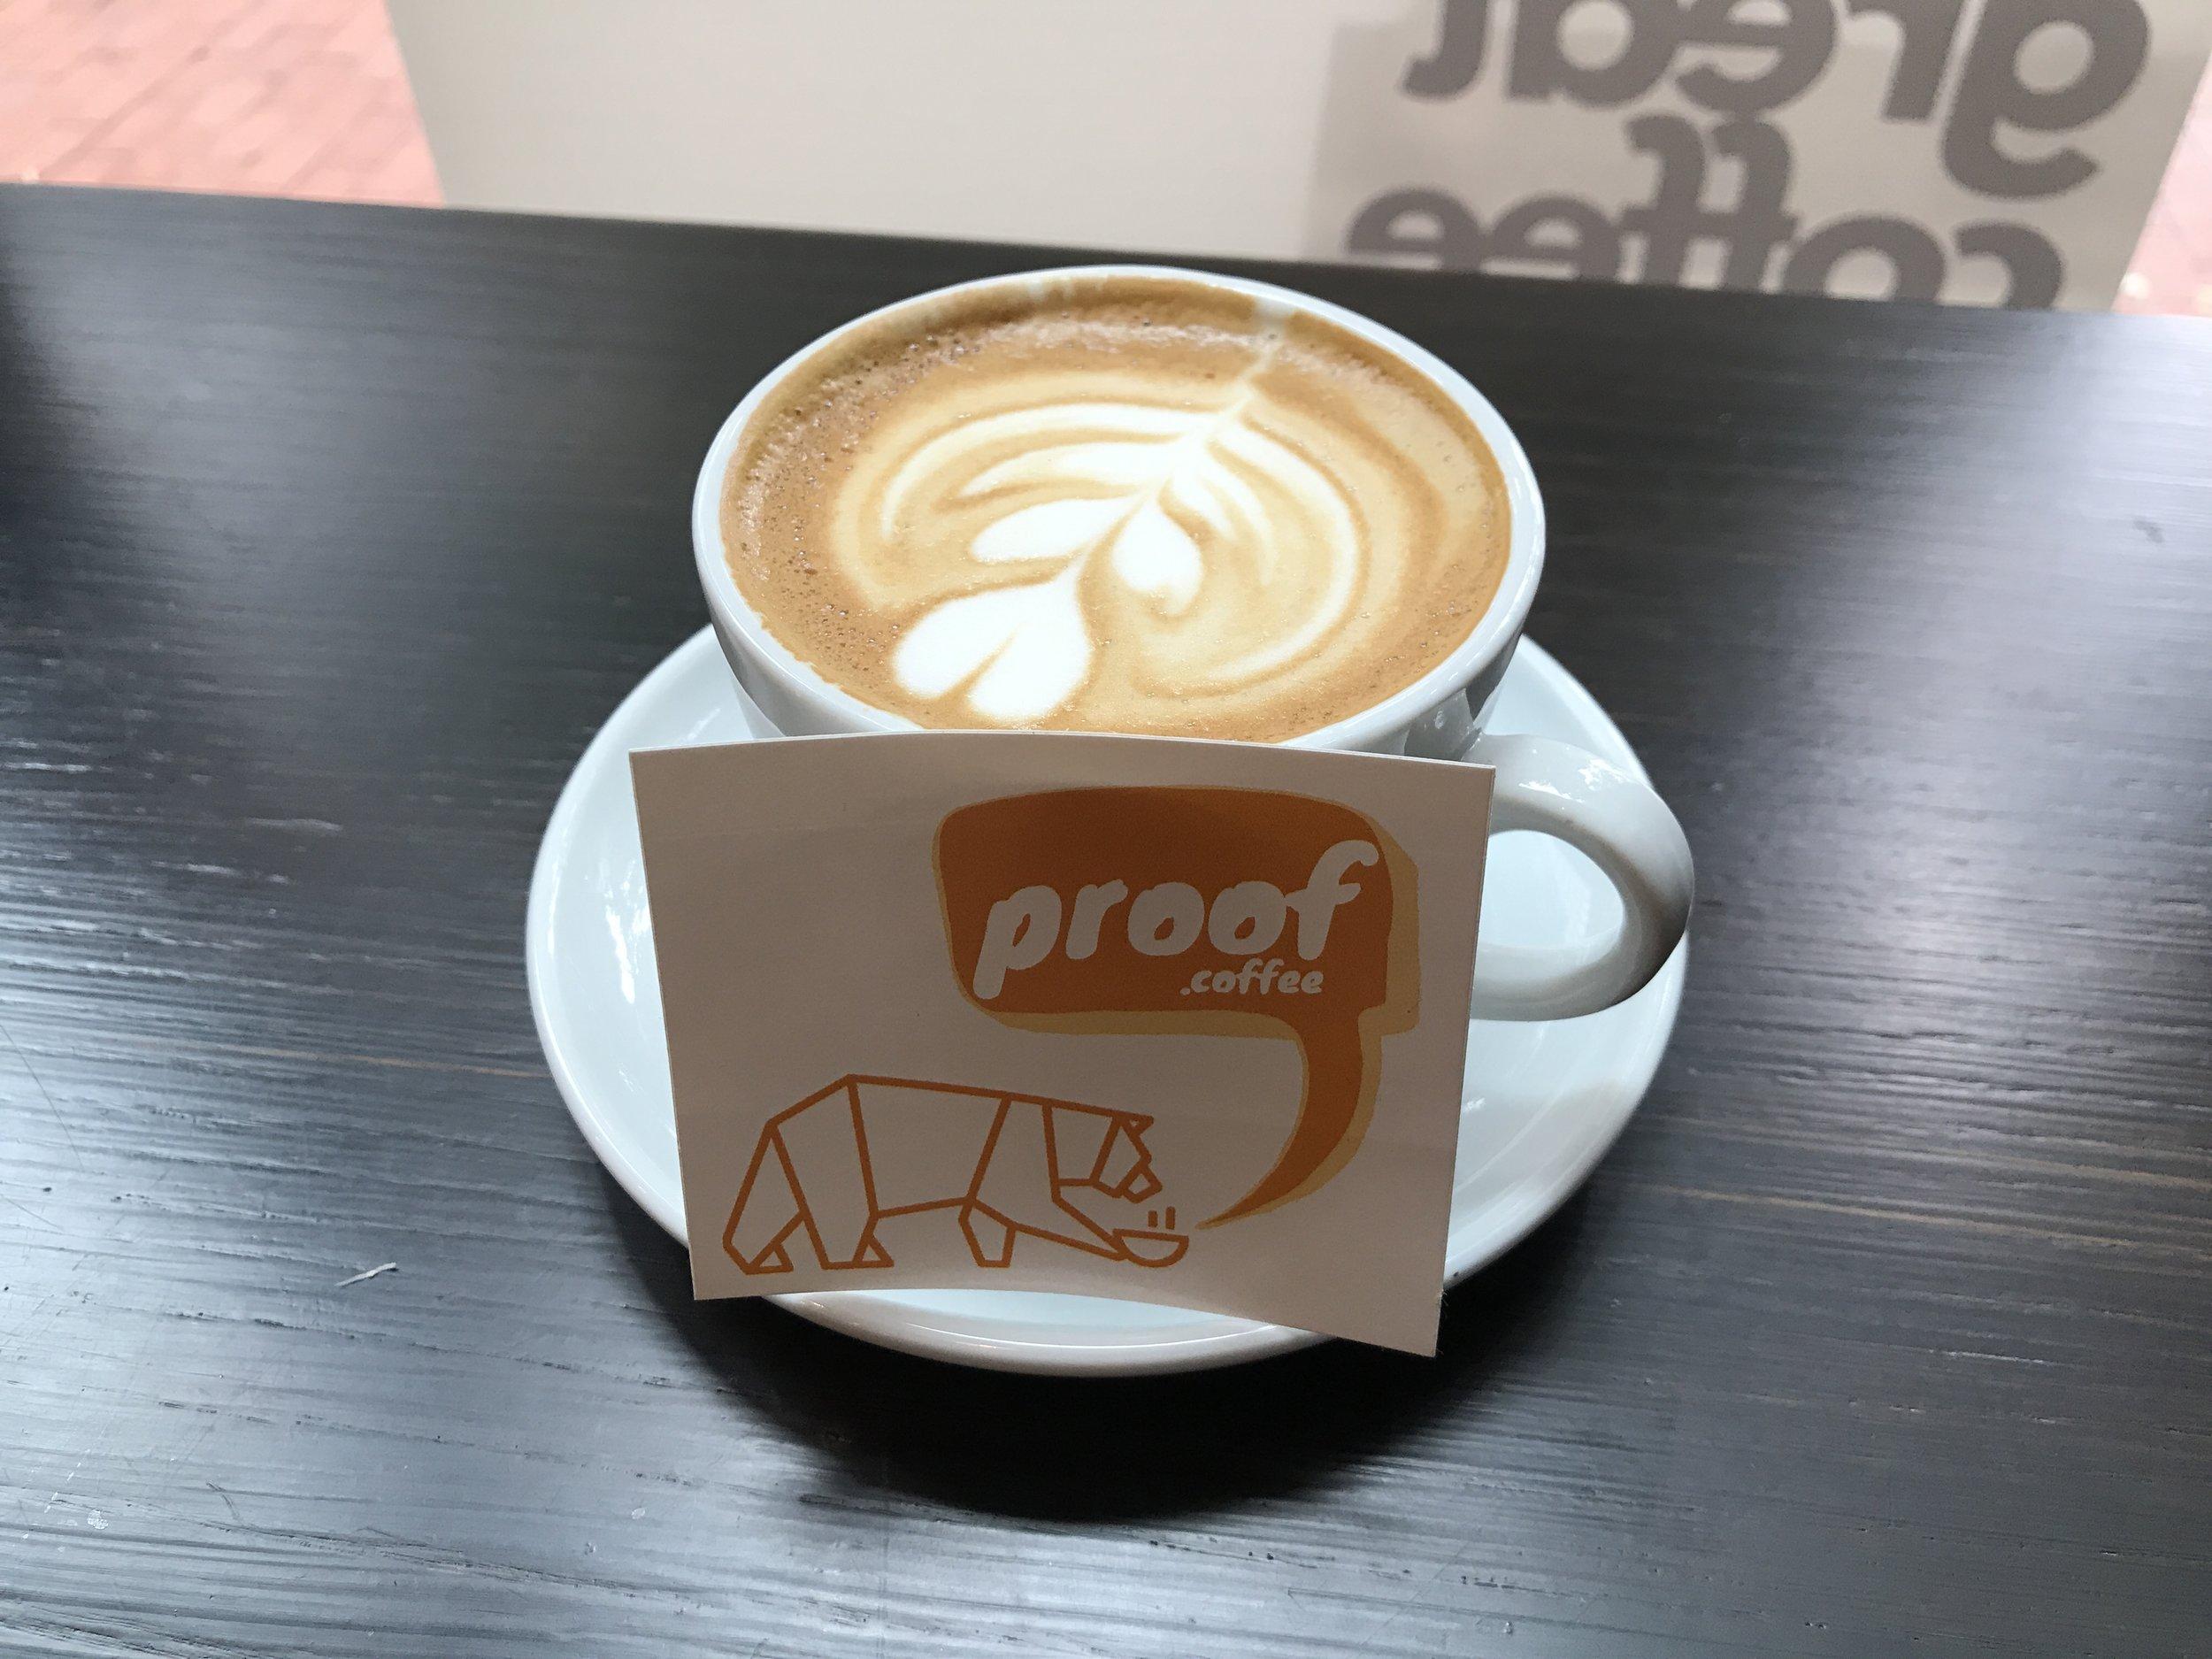 PROOF Coffee, New York